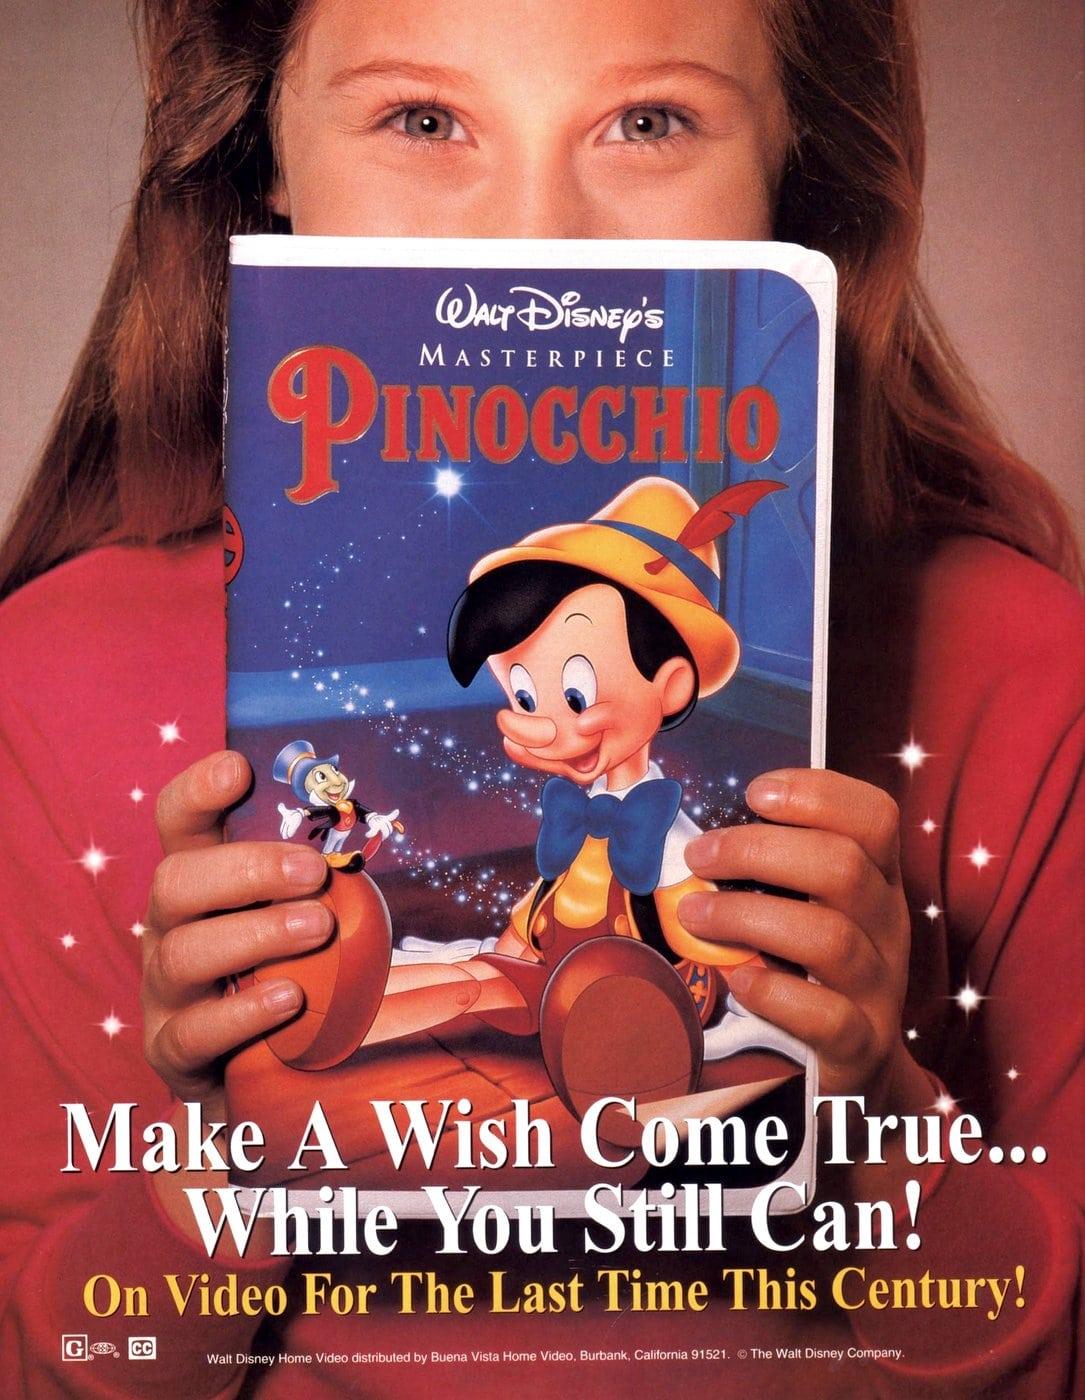 Walt Disney's masterpeice Pinocchio on home video (1993)